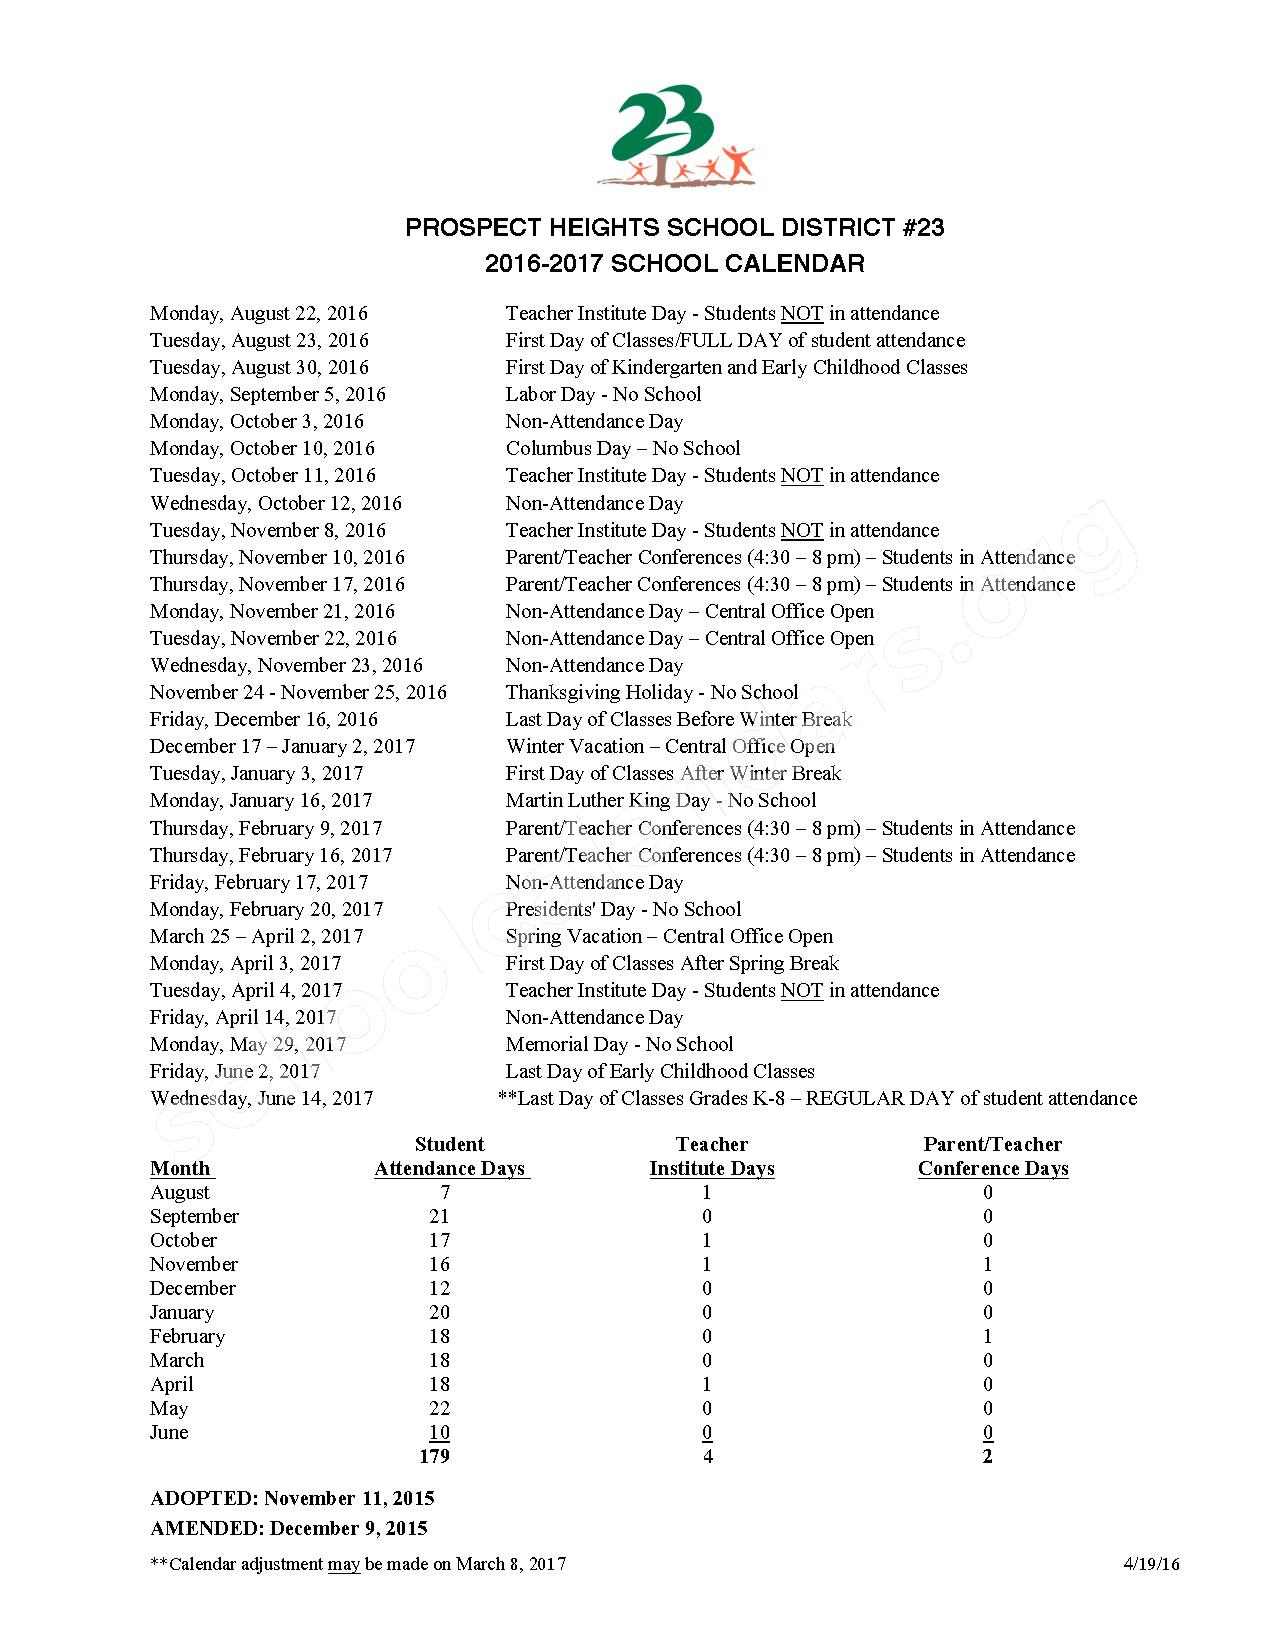 2016 - 2017 School Calendar – Prospect Heights School District 23 – page 1